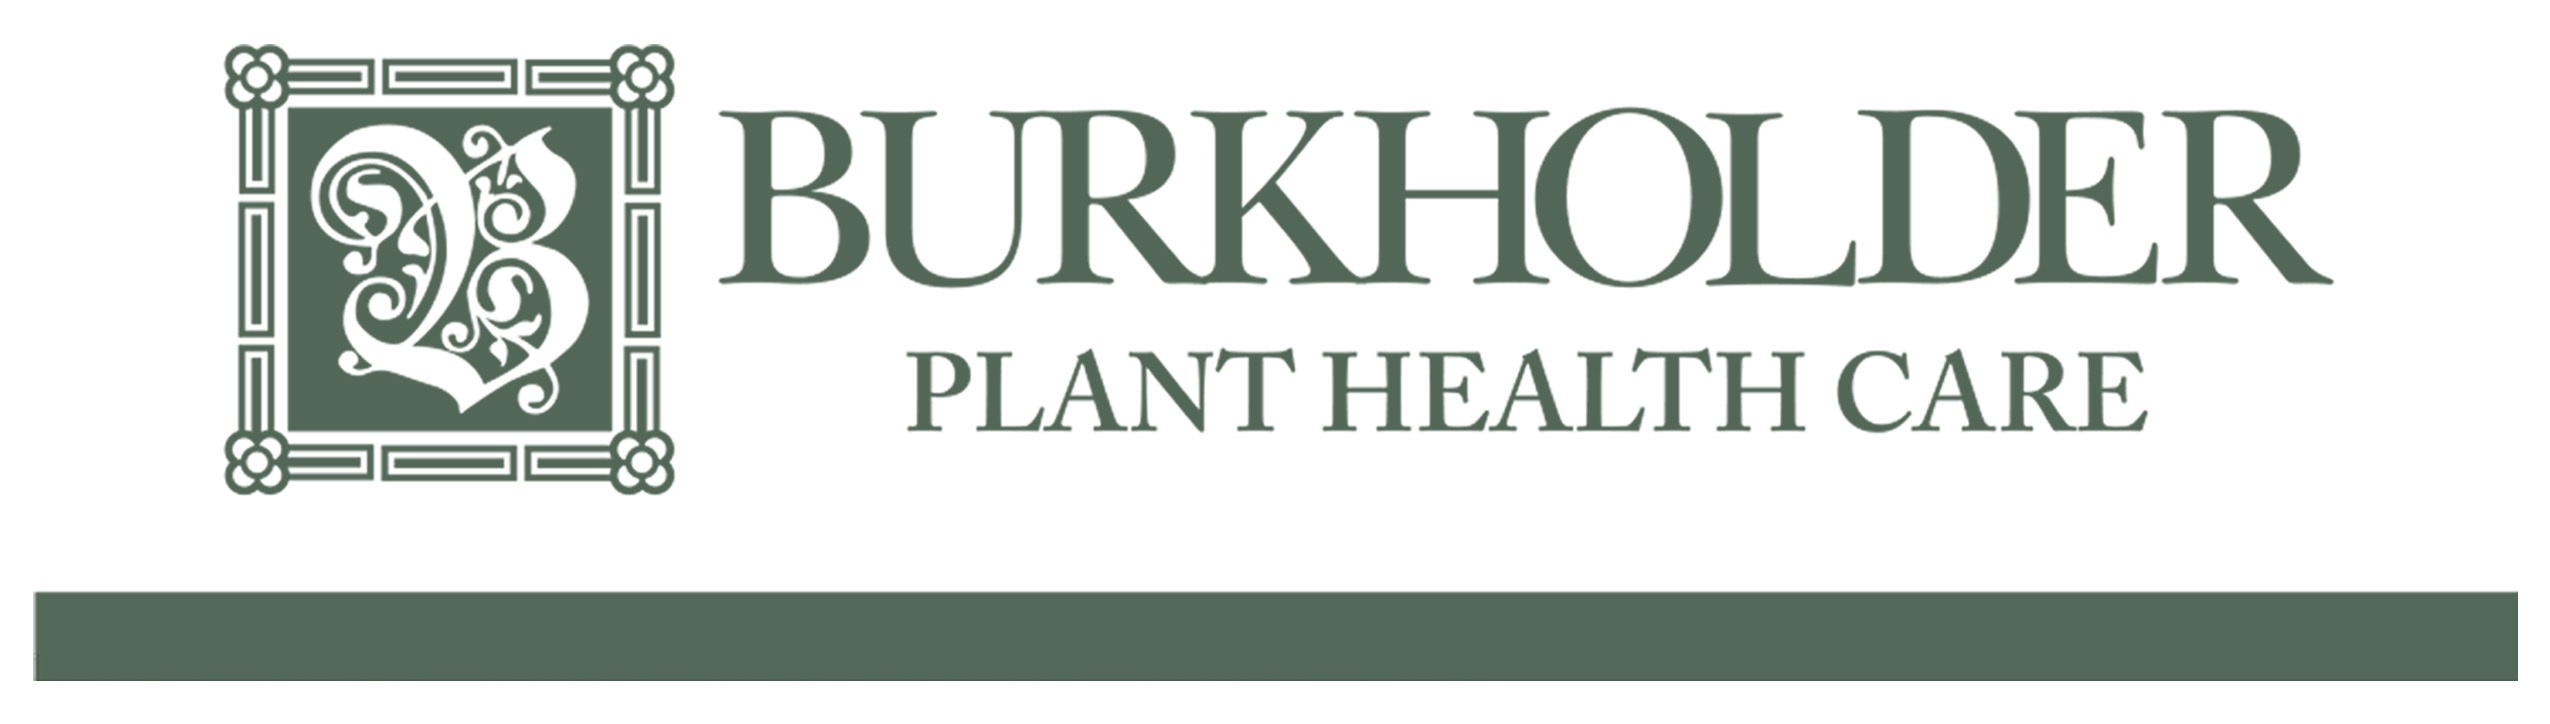 Burkholder Landscaping